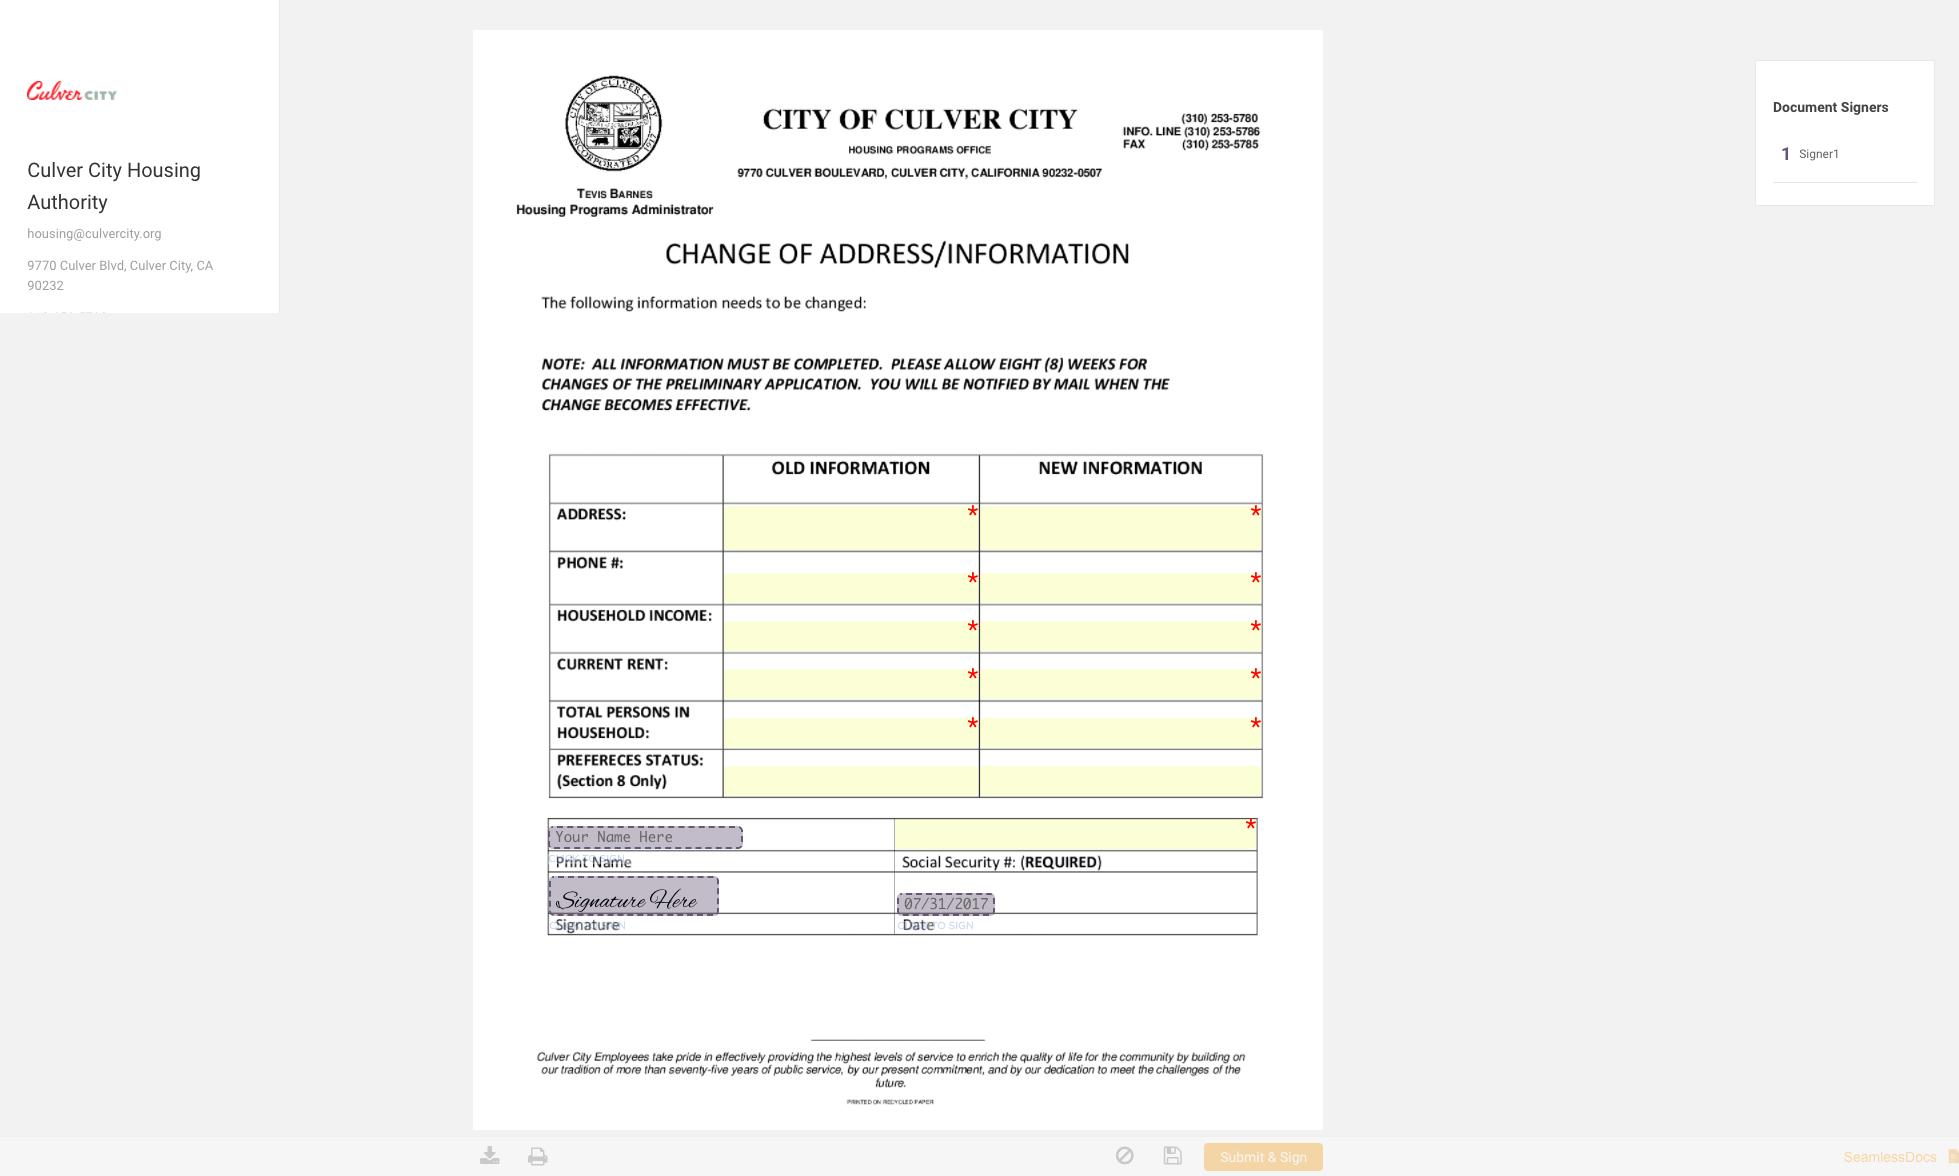 Form Examples | SeamlessGov Blog